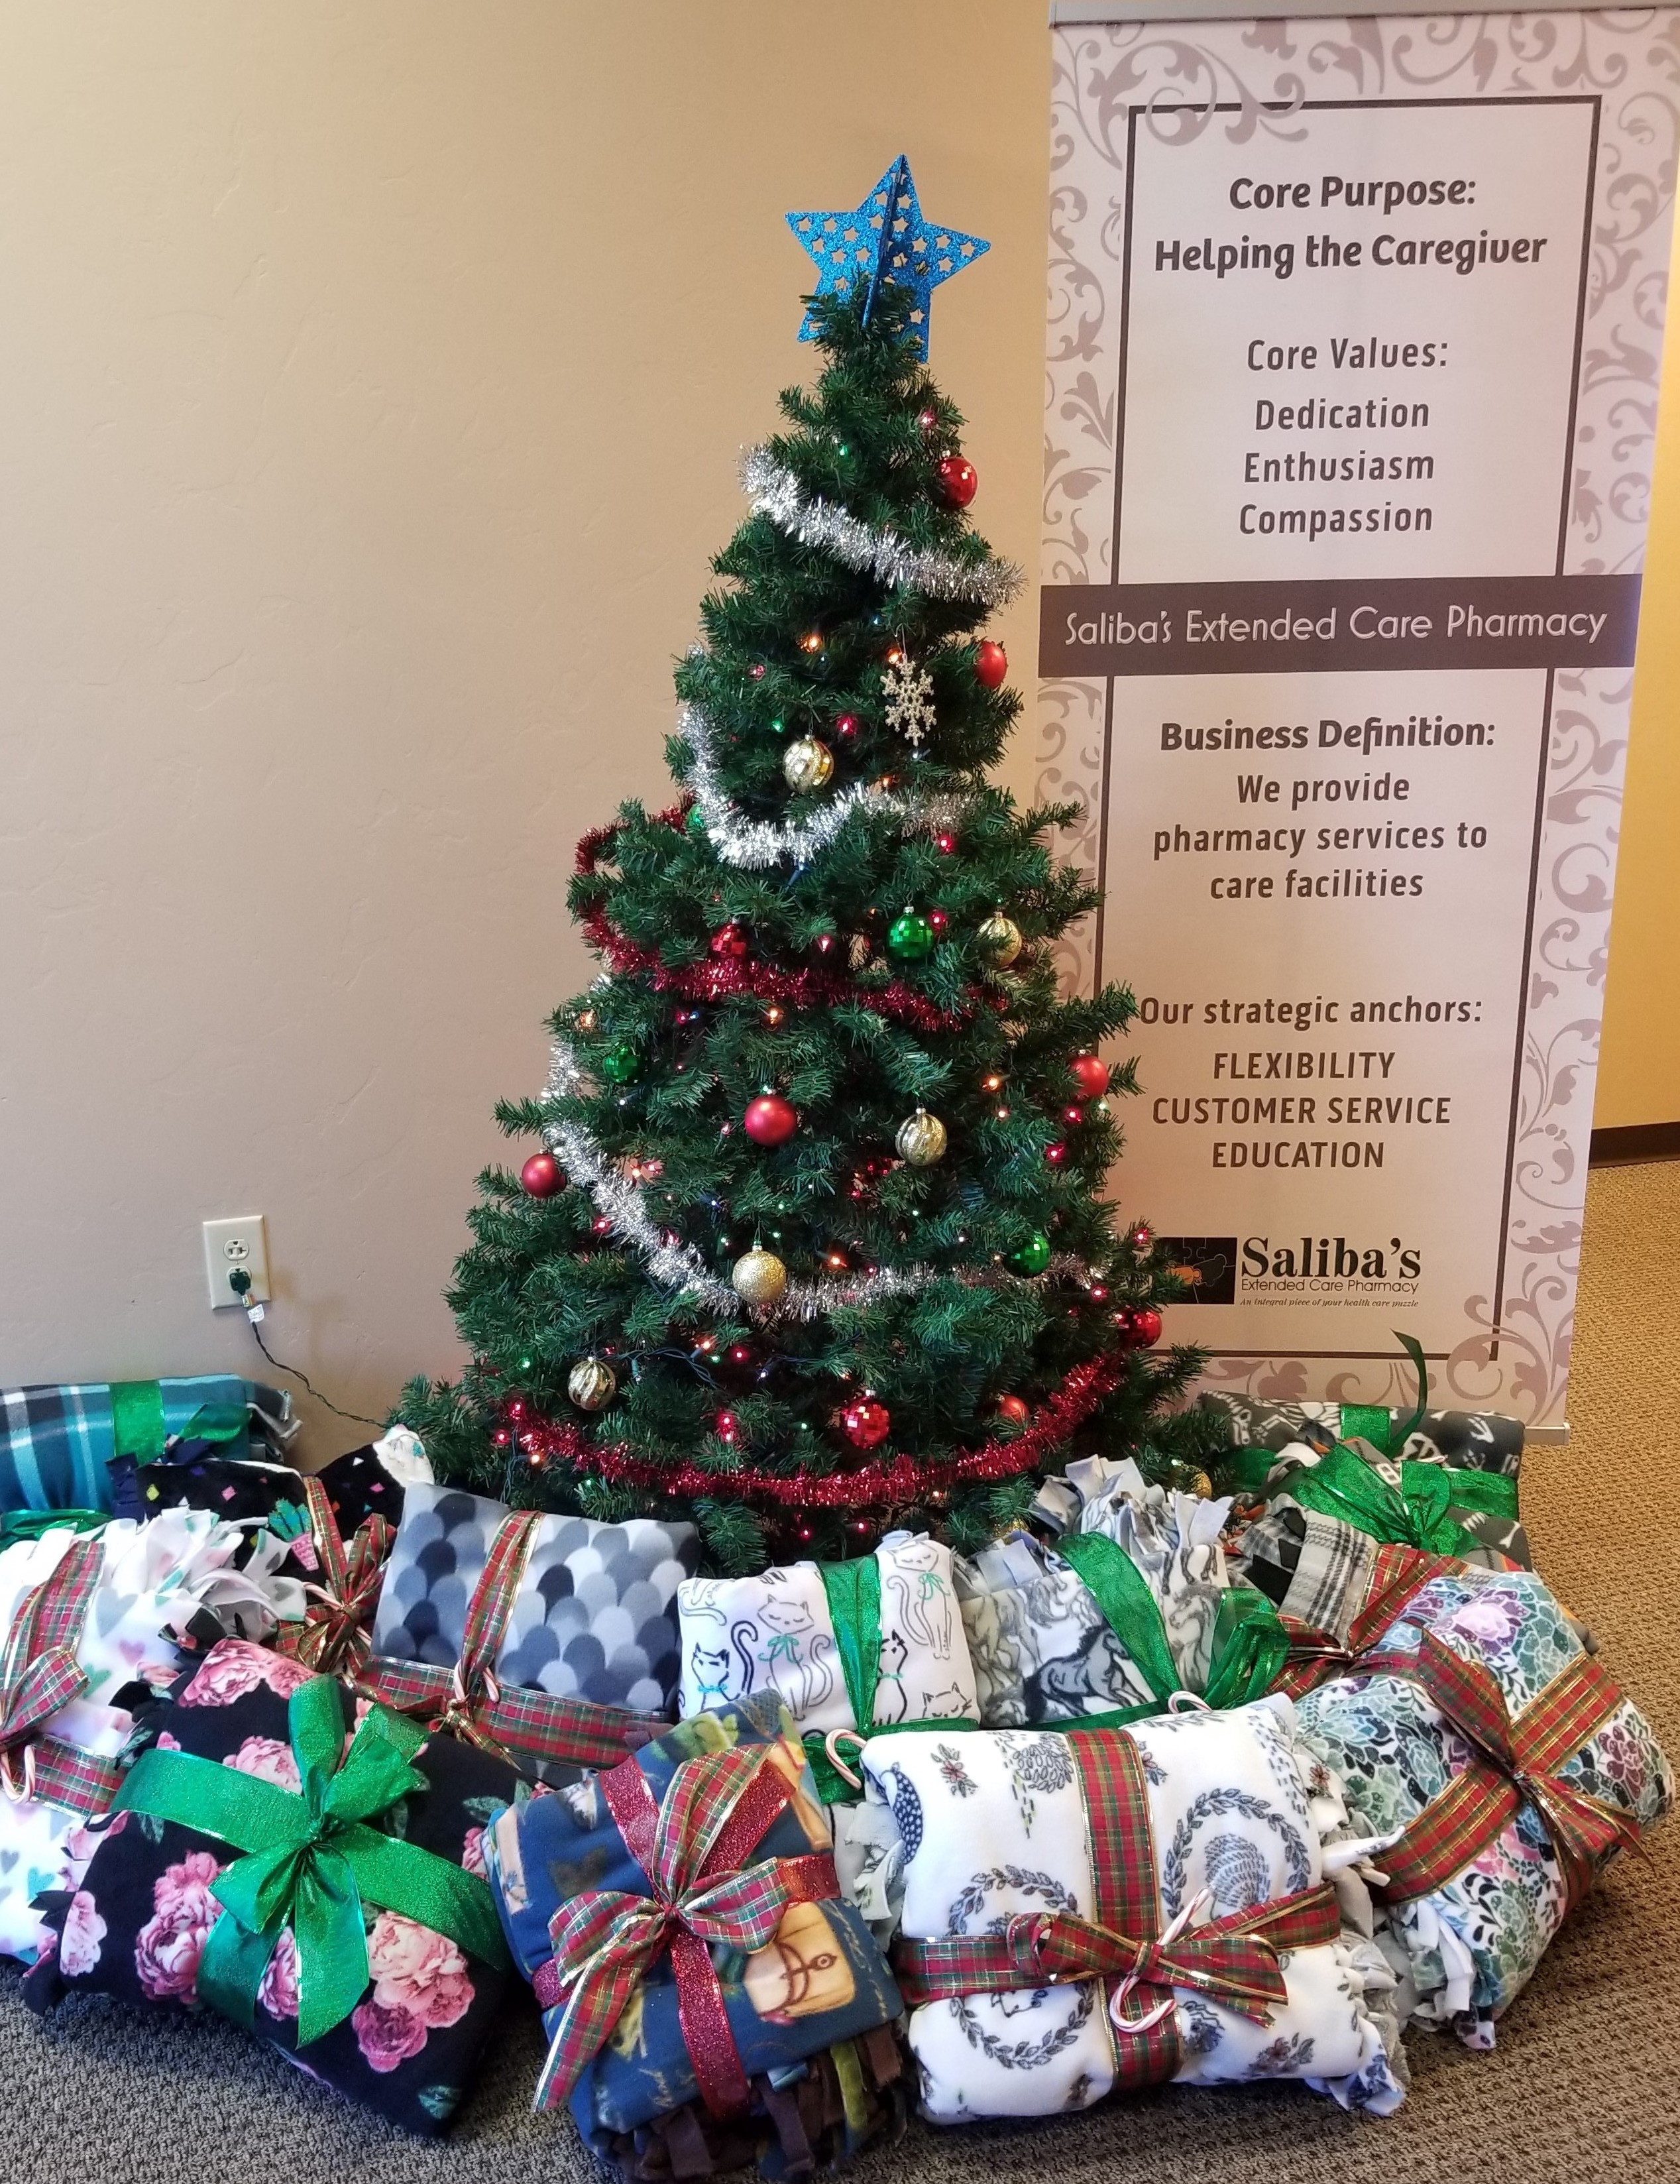 Christmas Services 2020 Tucson.Com Saliba's Tucson Blanket Project Delights Community Residents